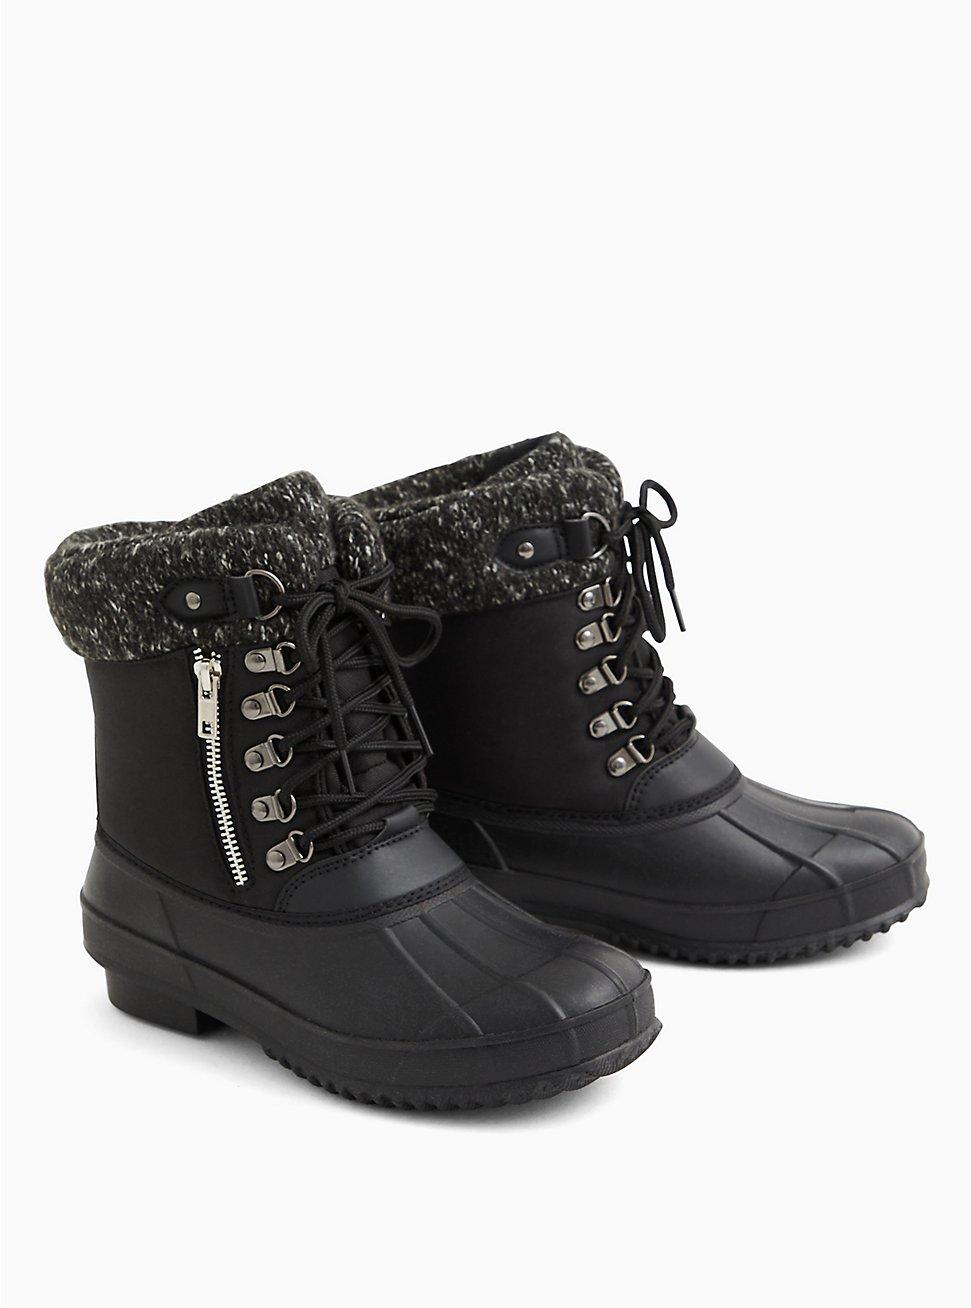 Black Nylon Sweater-Trimmed Duck Boot (WW), BLACK, hi-res